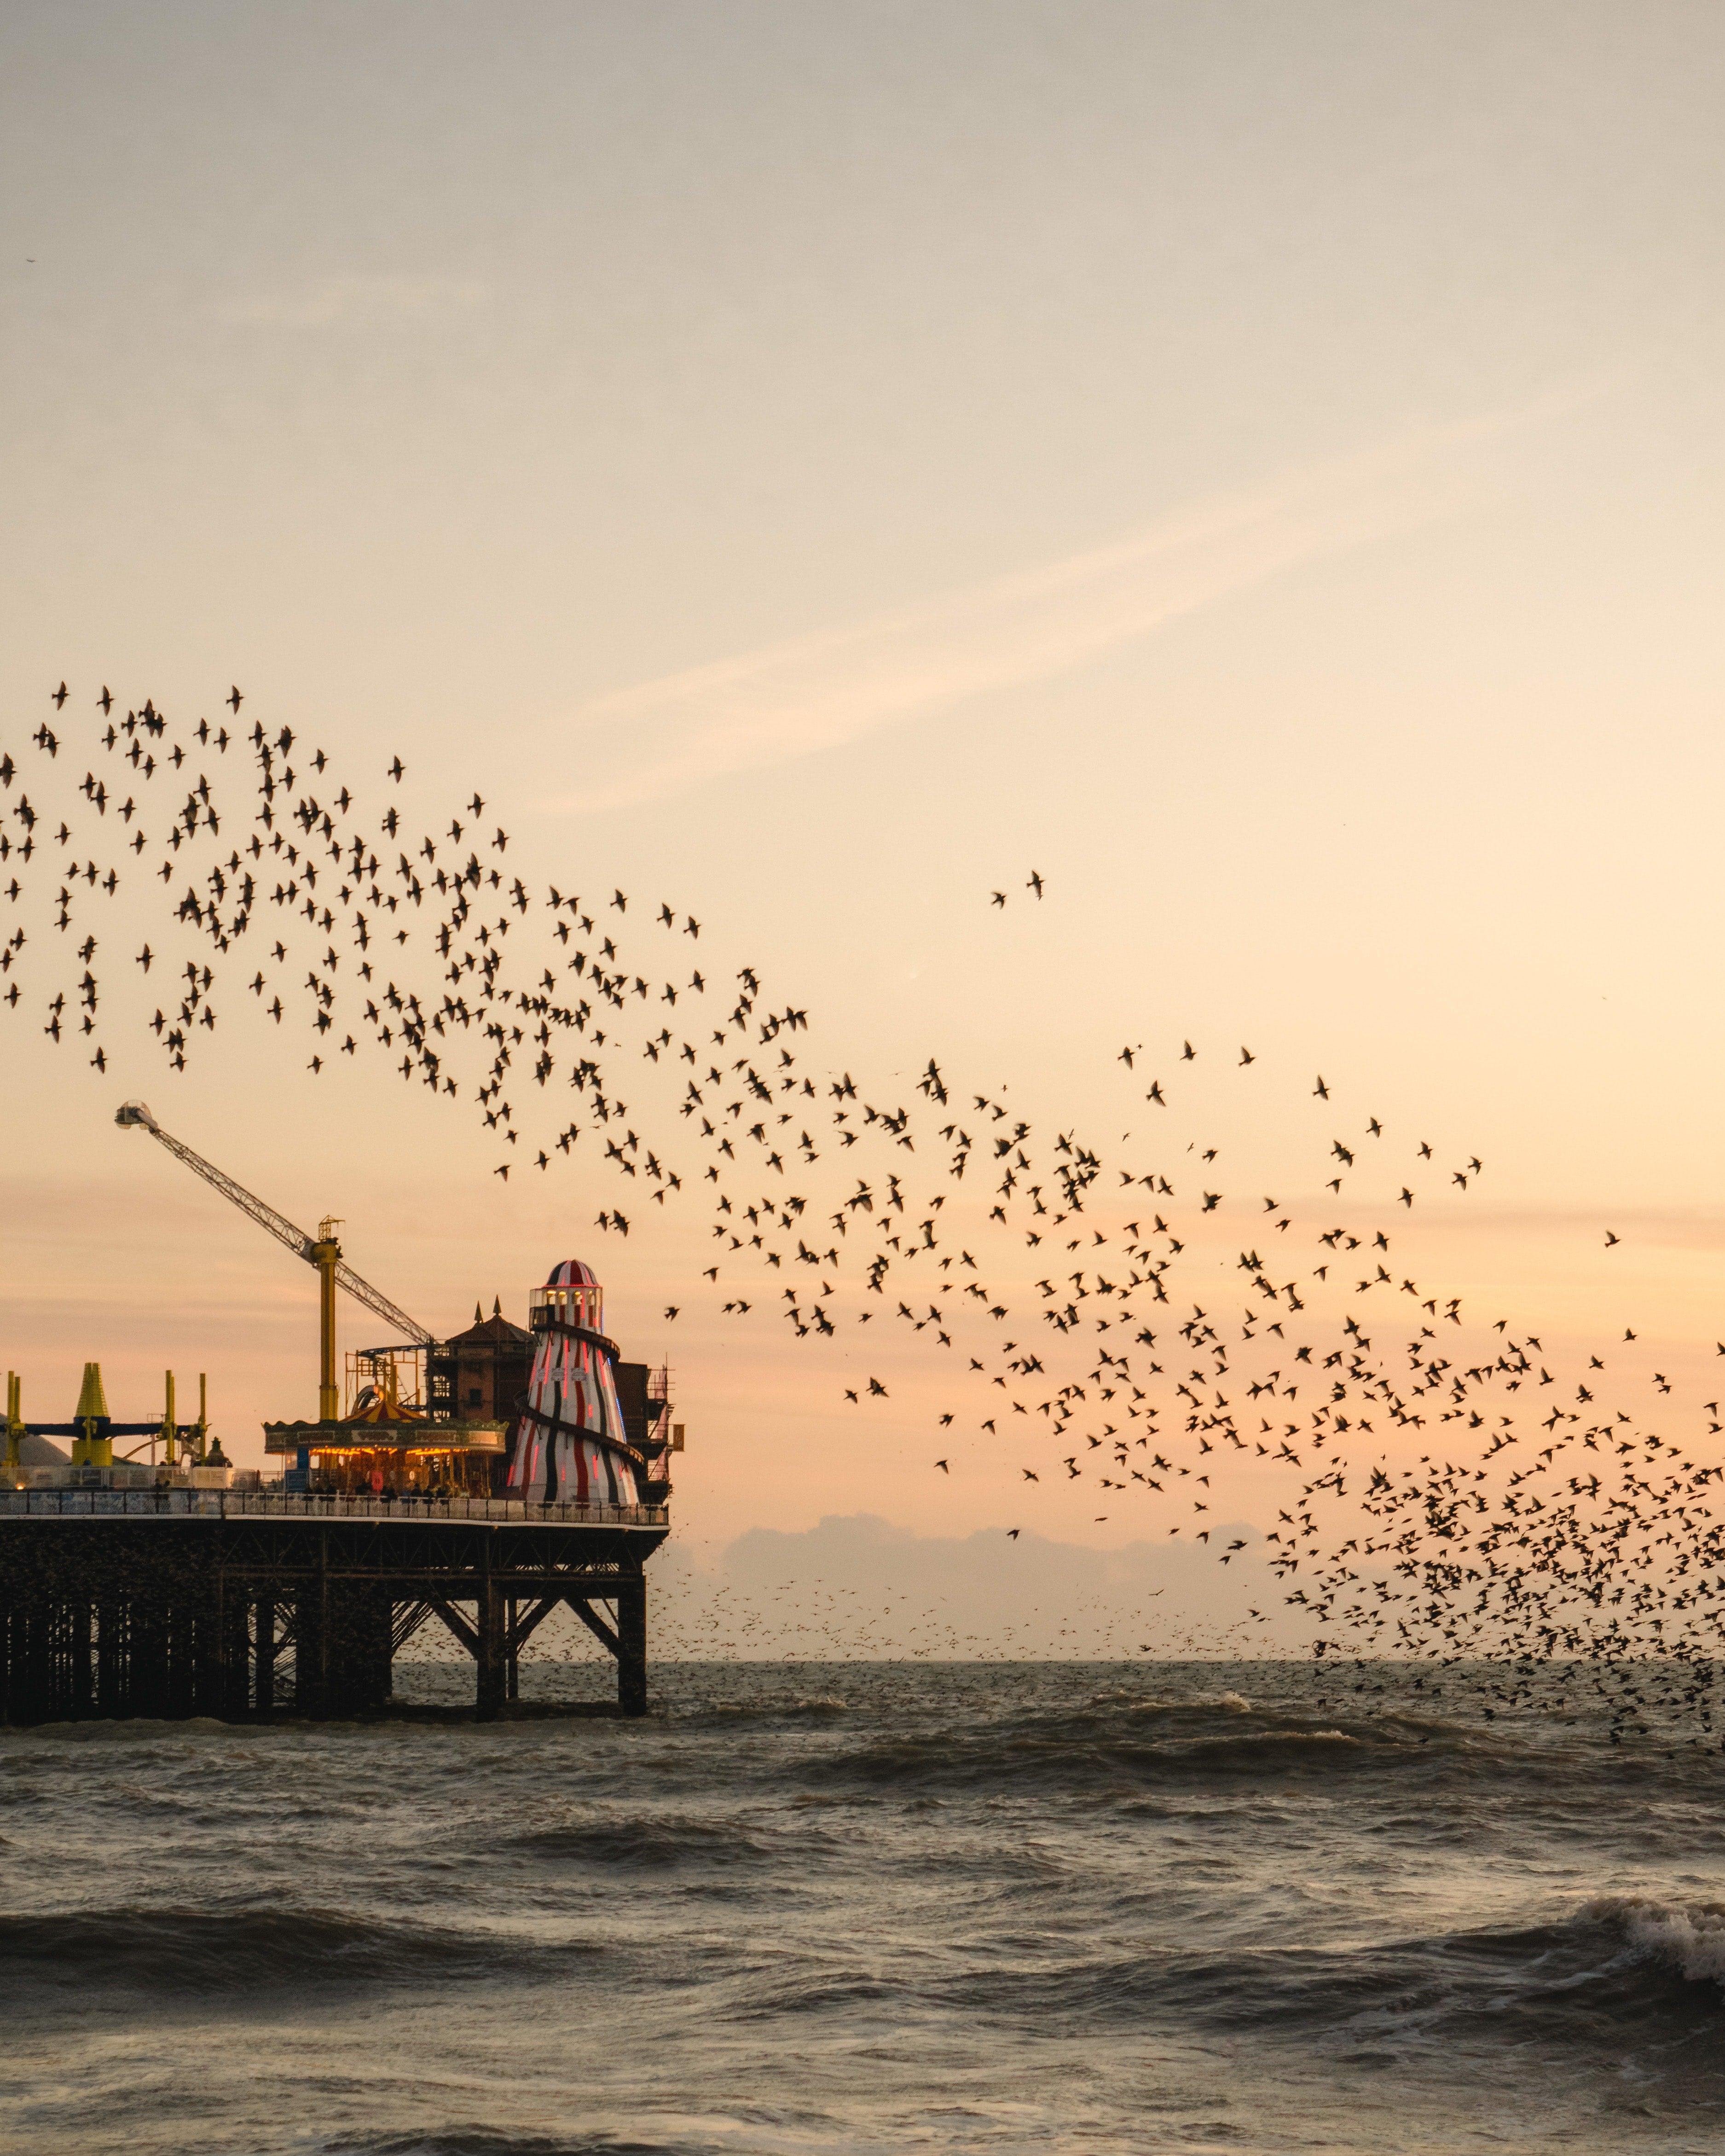 Starlings over Brighton pier